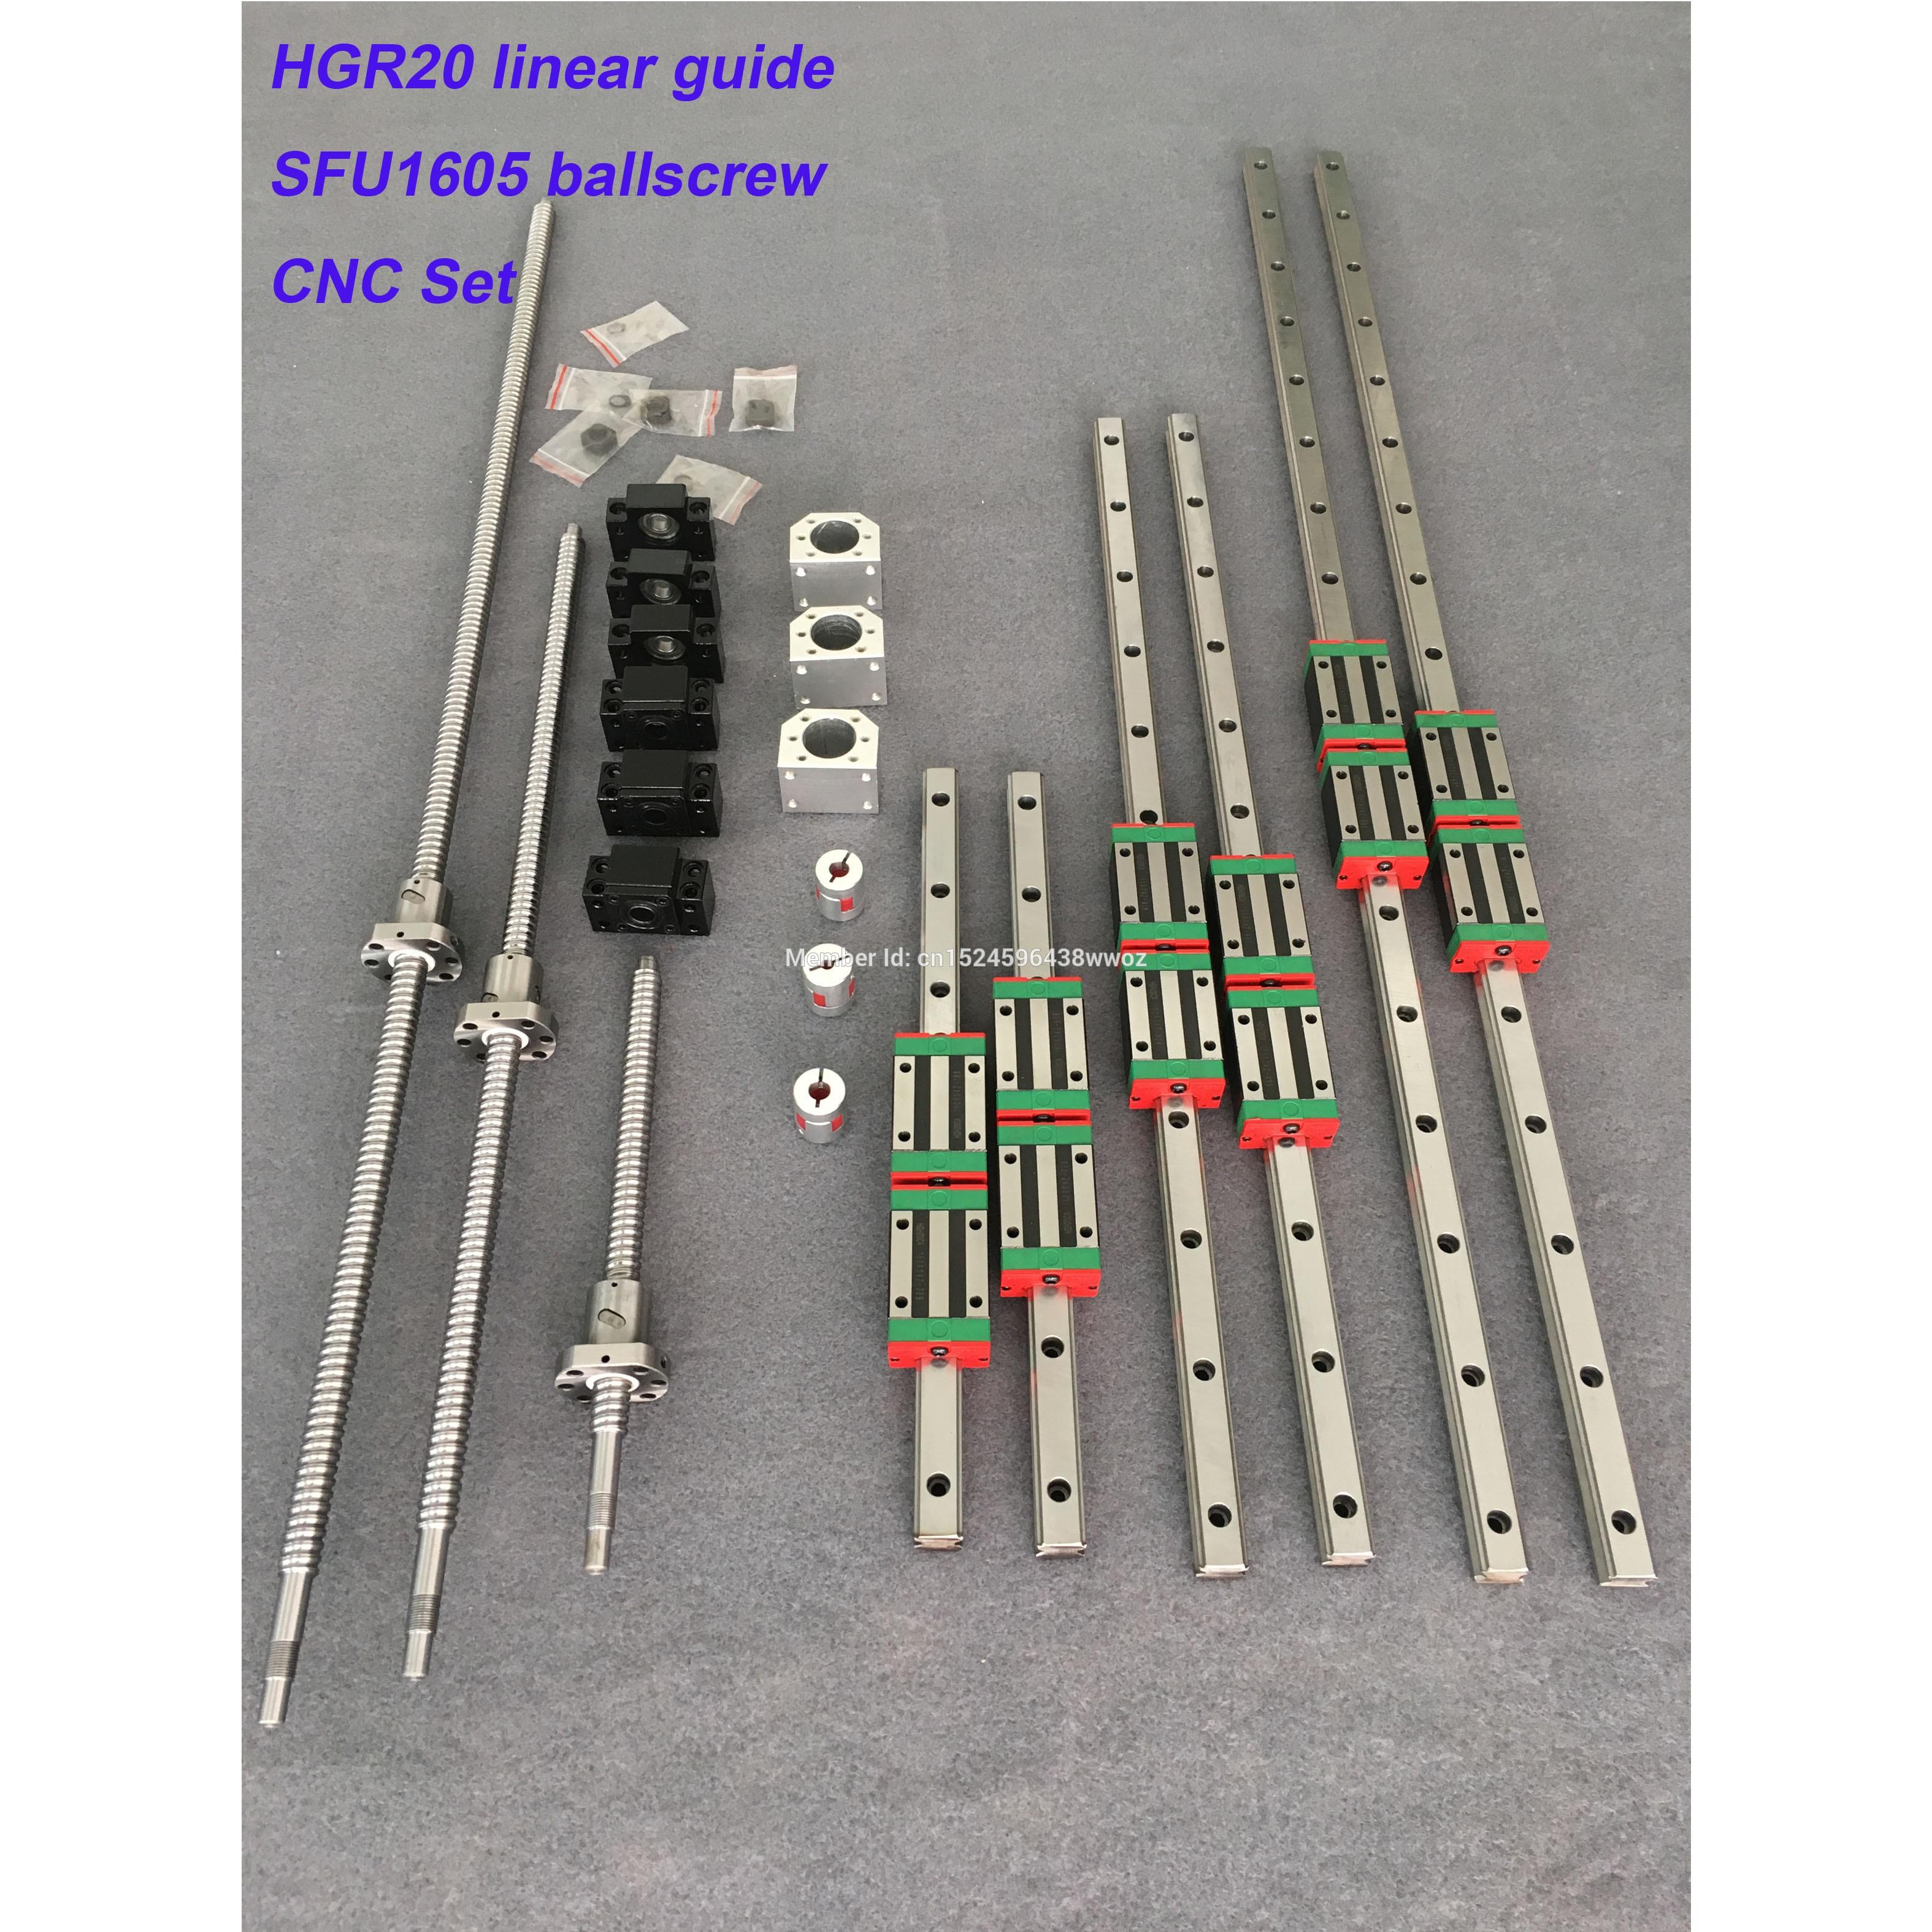 RU تسليم Ballscrew مربع الخطي دليل السكك الحديدية 6 مجموعة HGR20 - 400/700/1000 مللي متر + SFU1605 - 400/700/1000 مللي متر + BK/BF12 CNC جزء